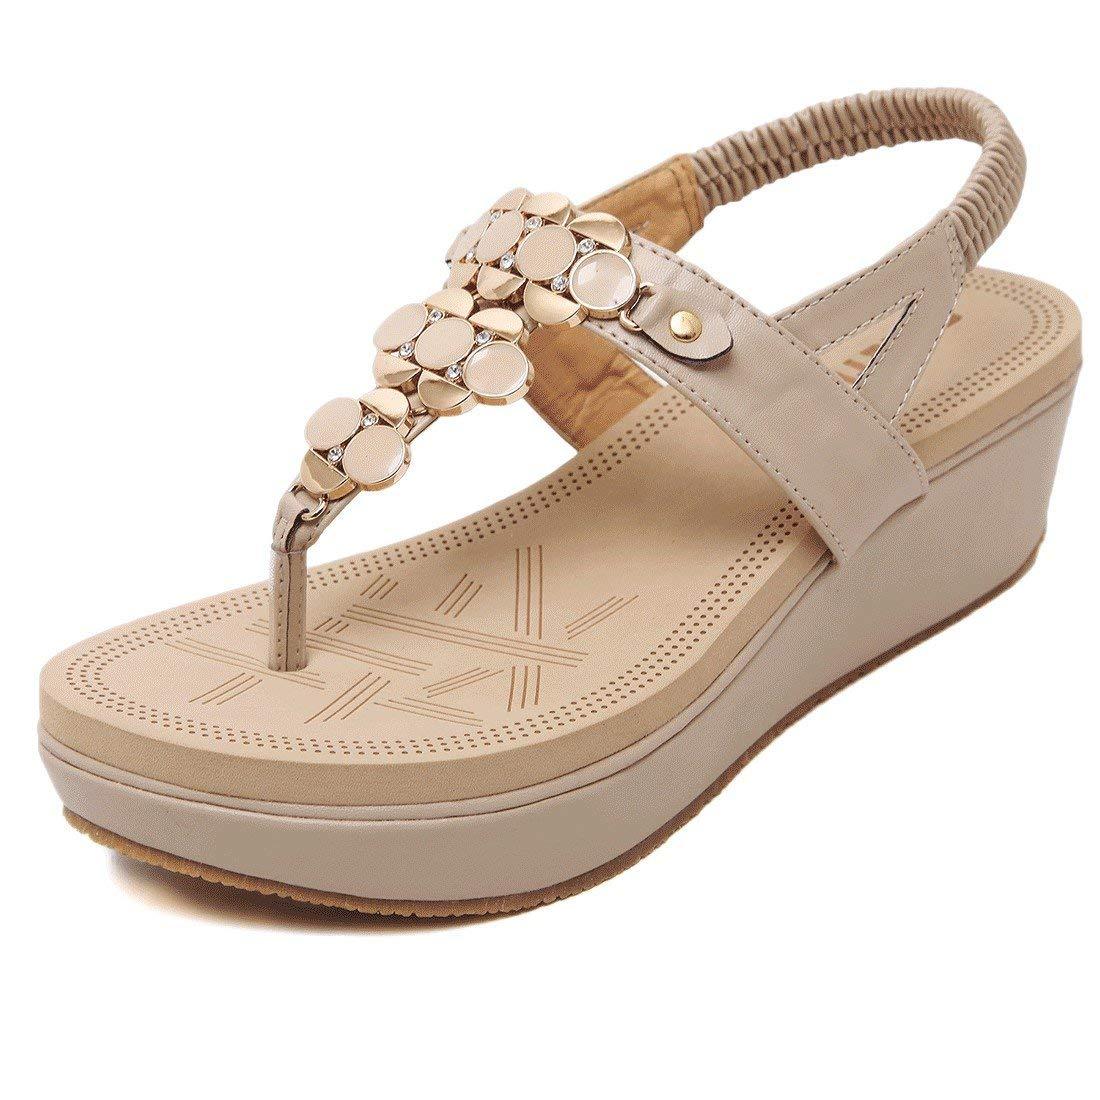 YIBLBOX Womens T-Strap Rhinestone Summer Platform Wedge Sandals Casual Beach Slip on Shoes Flip Flops